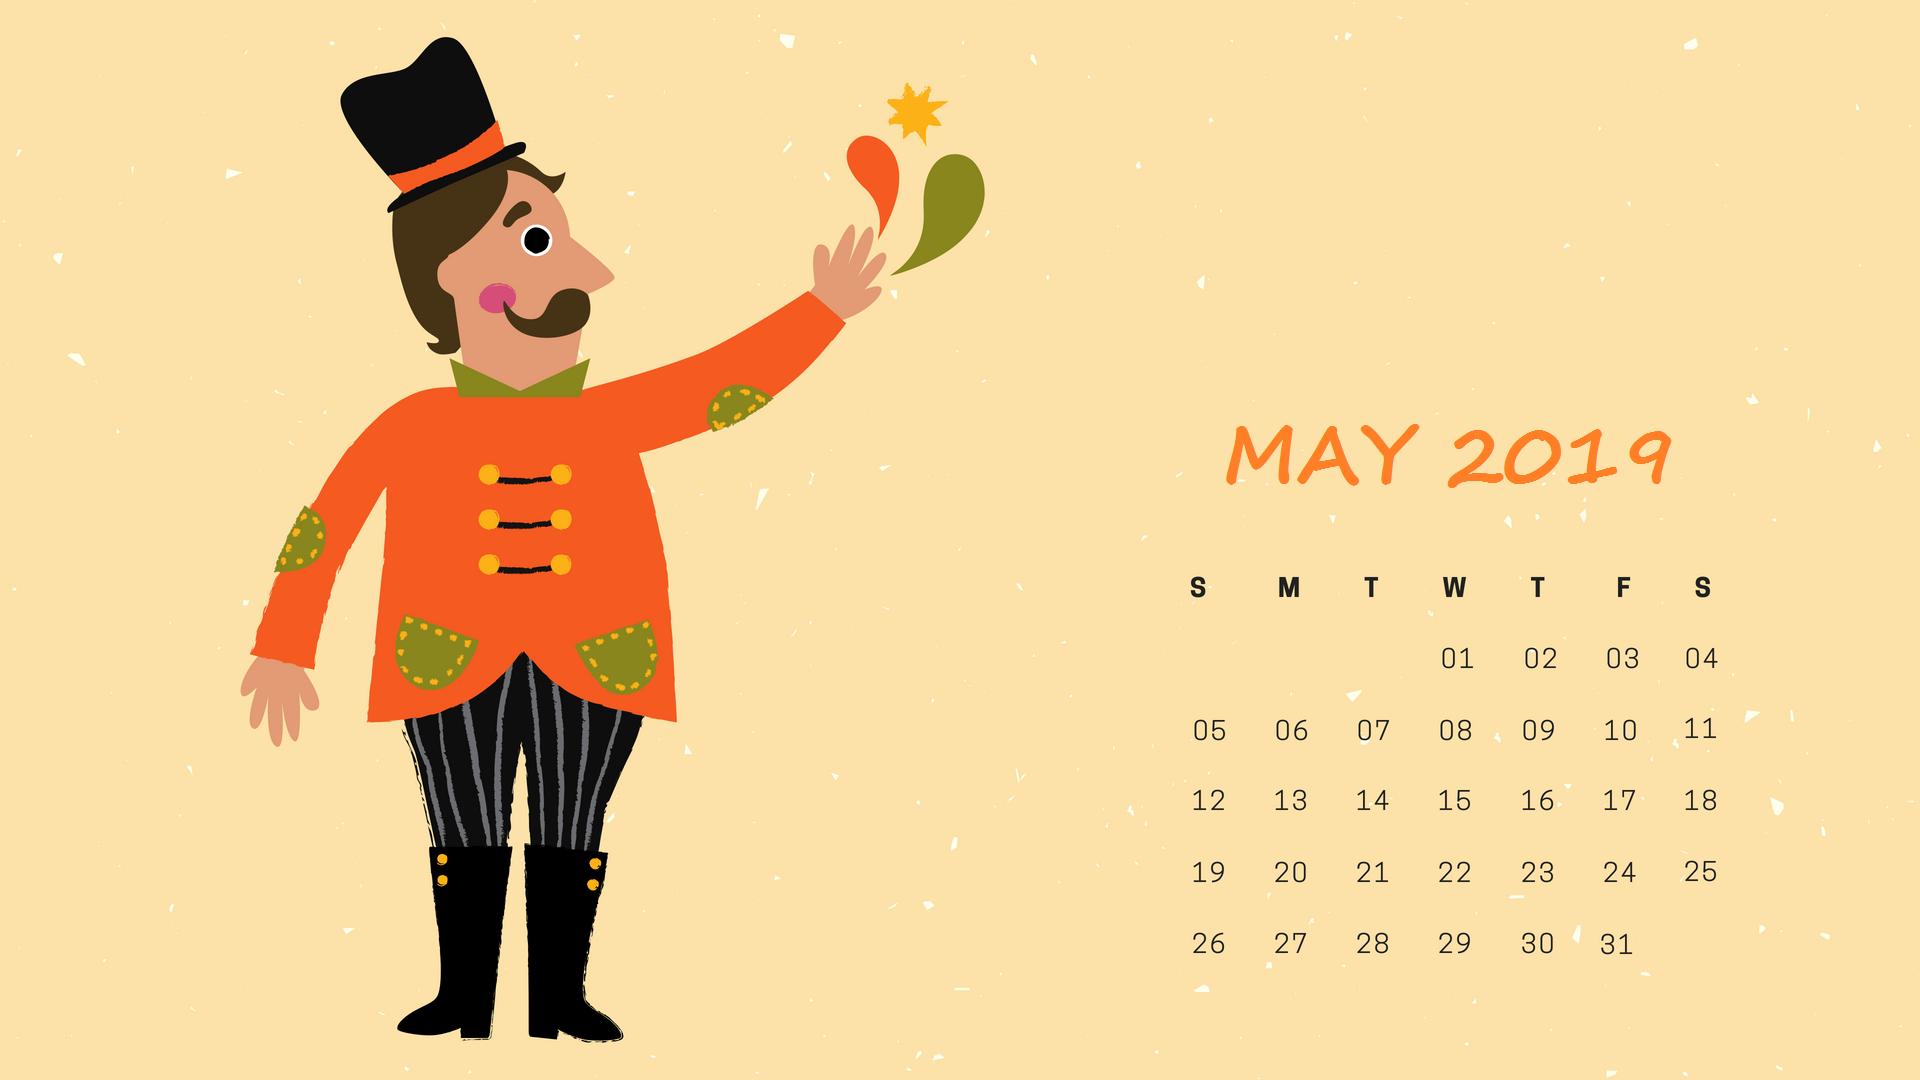 May 2019 Calendar Wallpaper HD